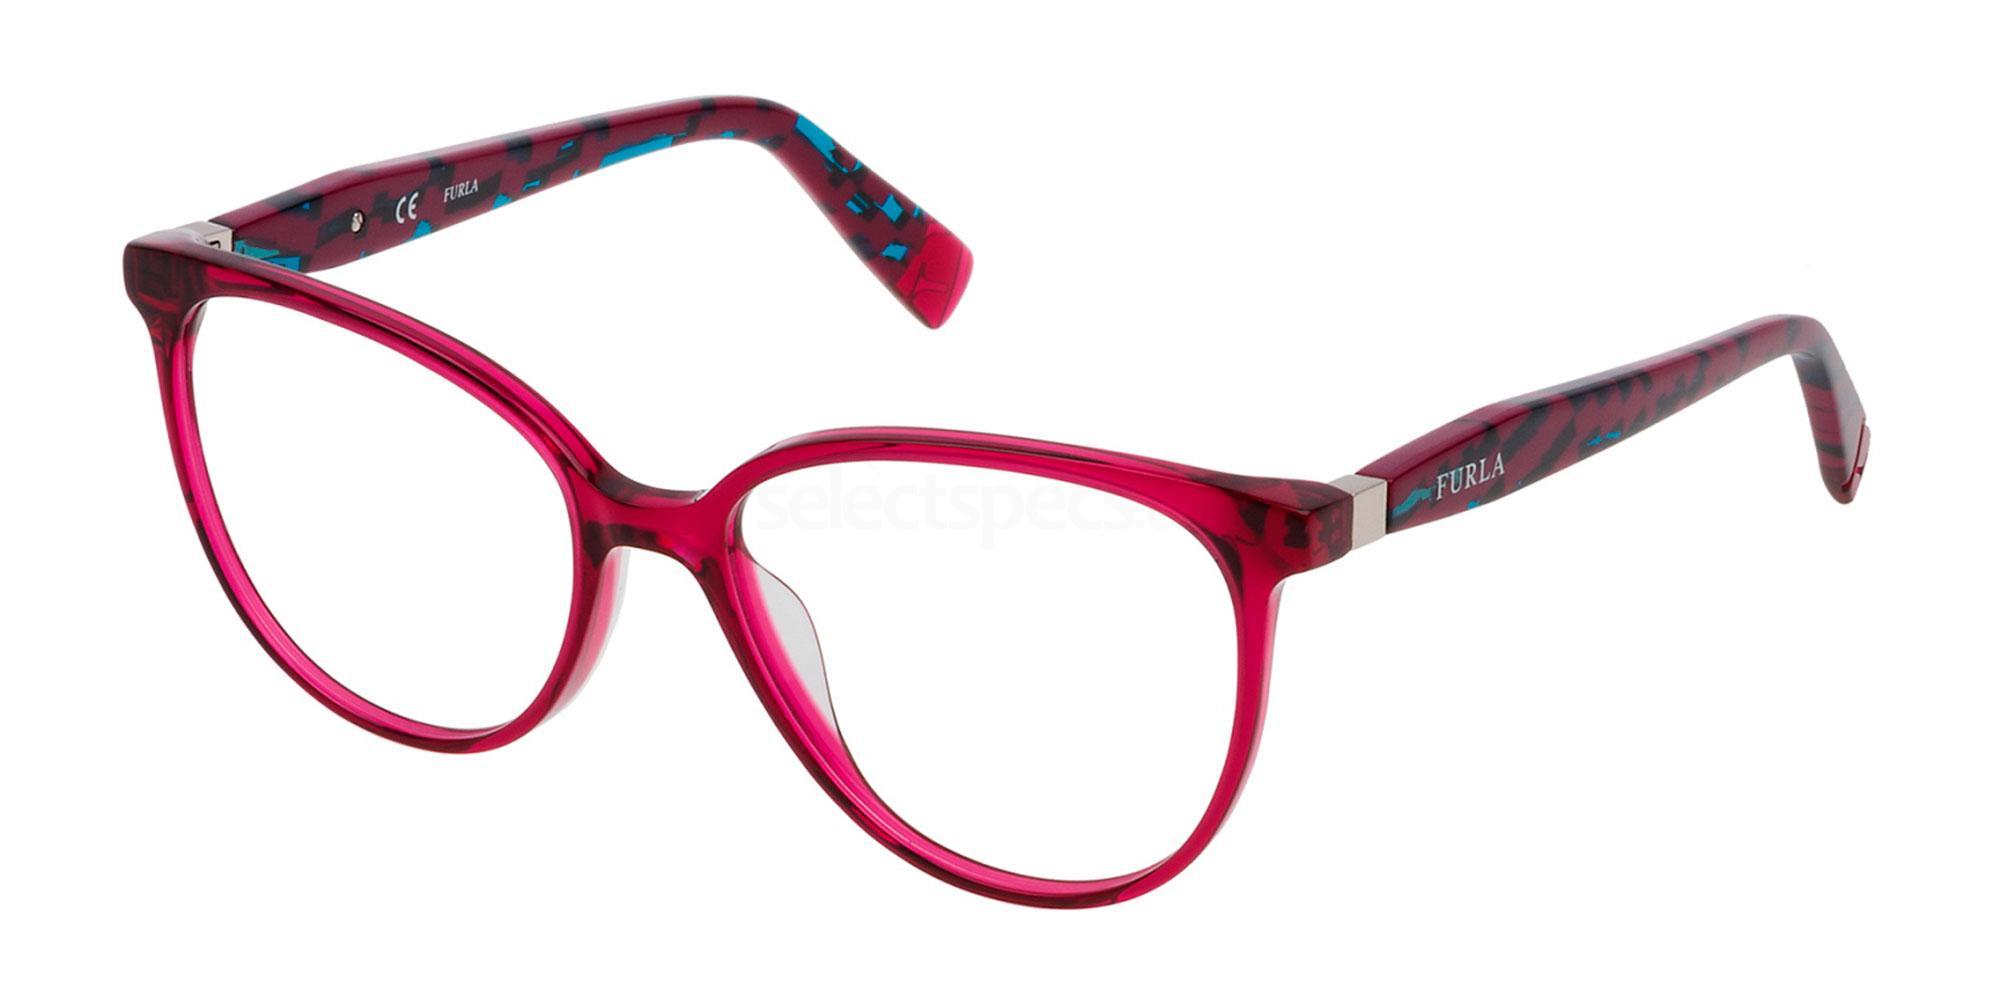 01BV VFU197 Glasses, Furla